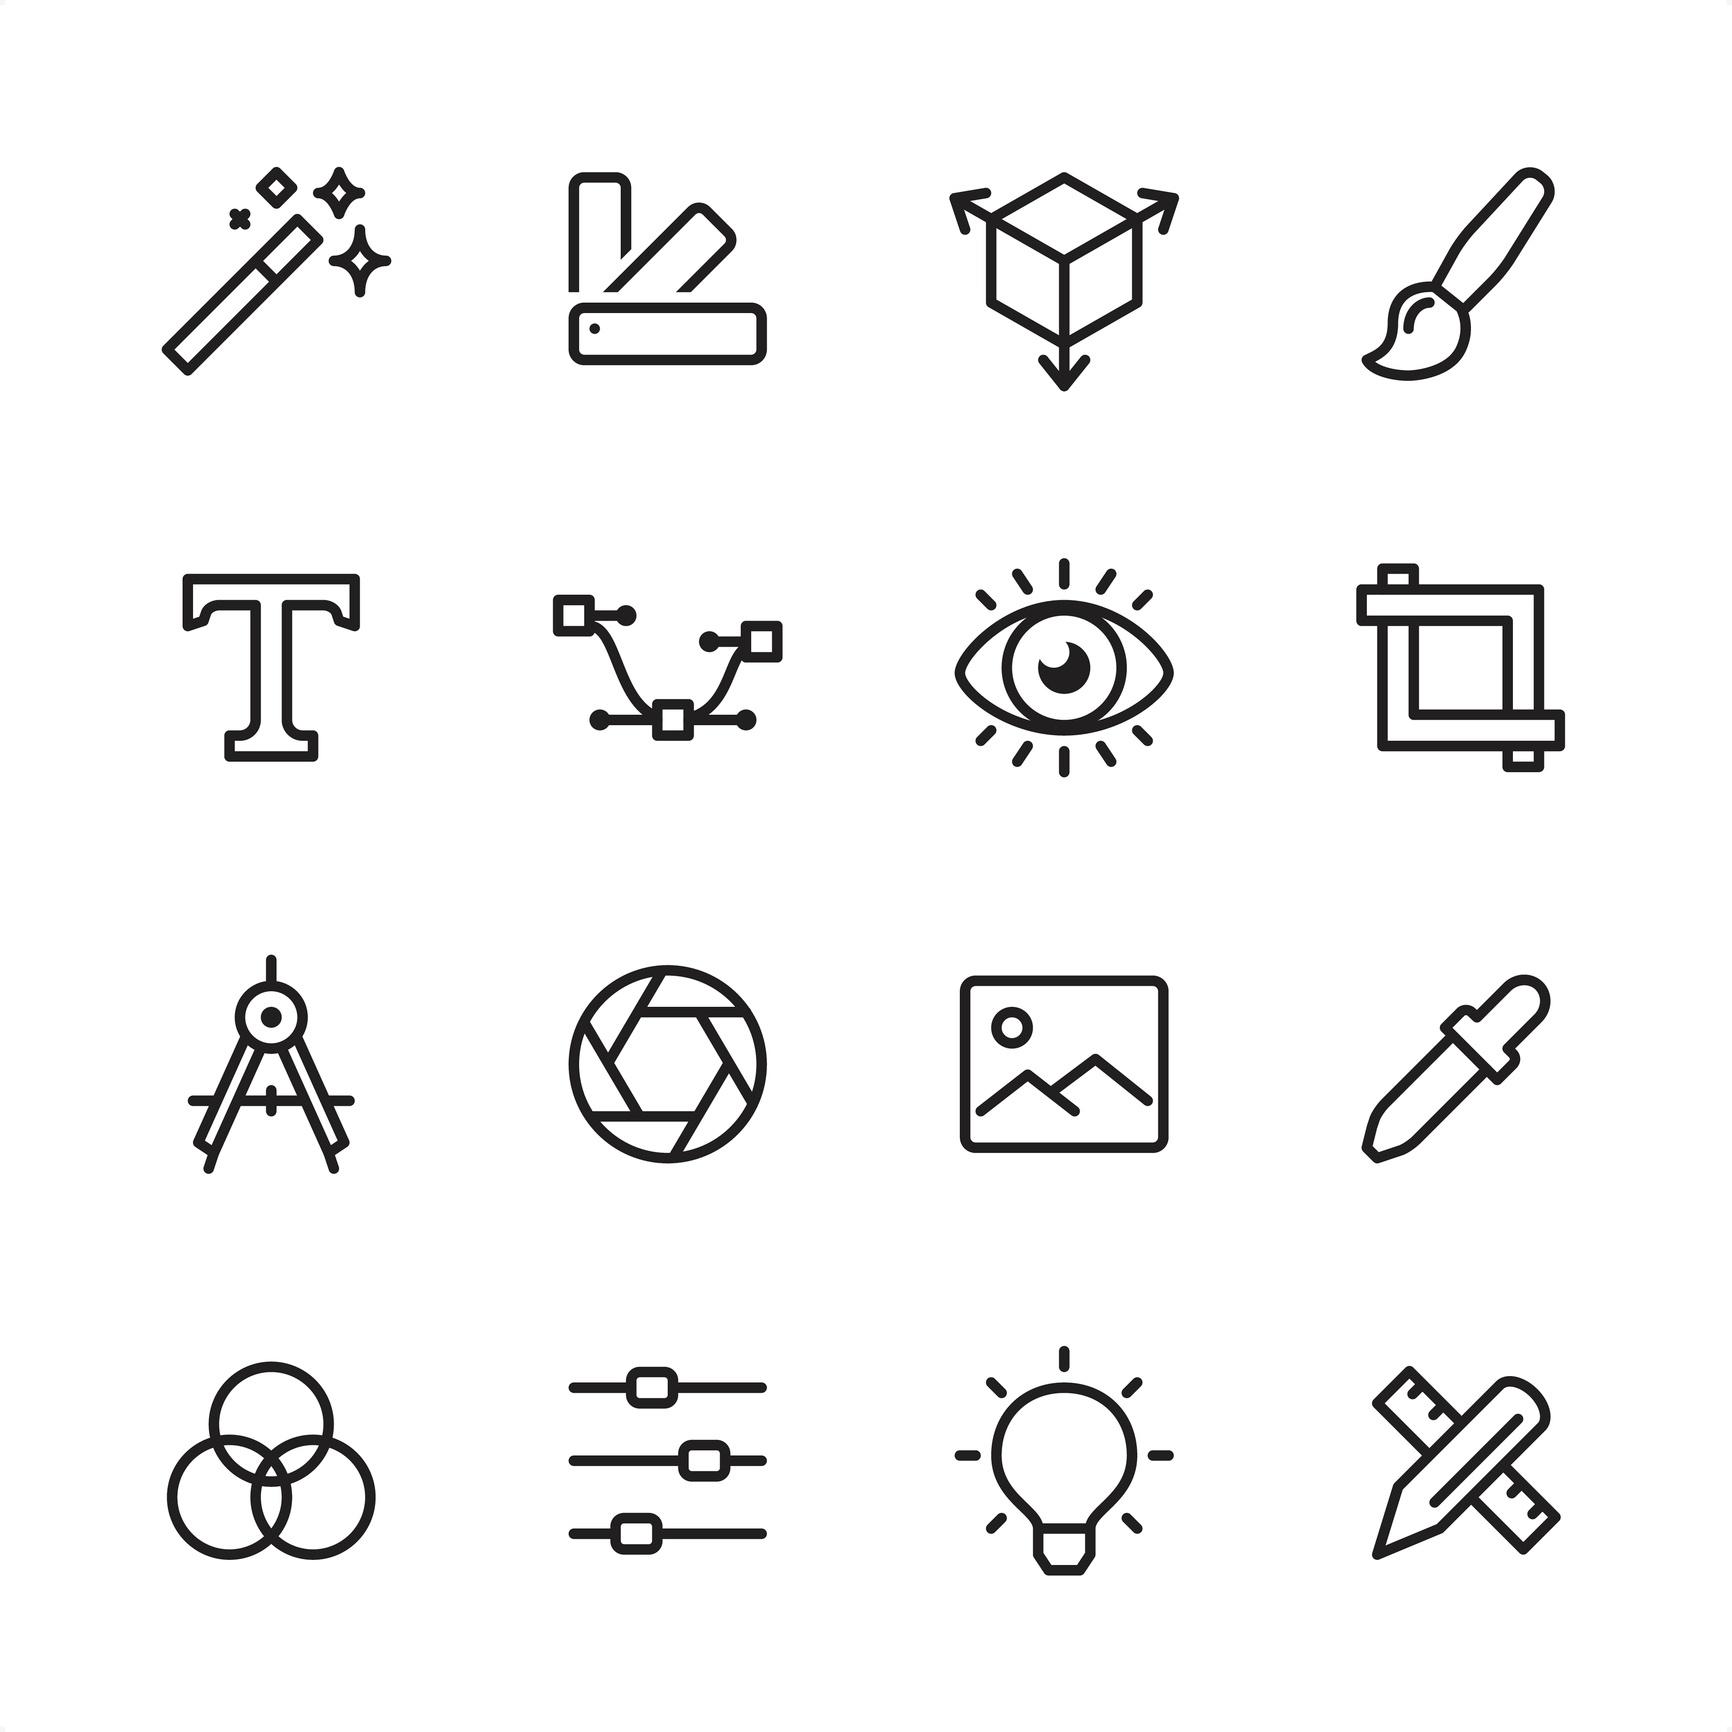 technical-icons-design-illustration.jpg